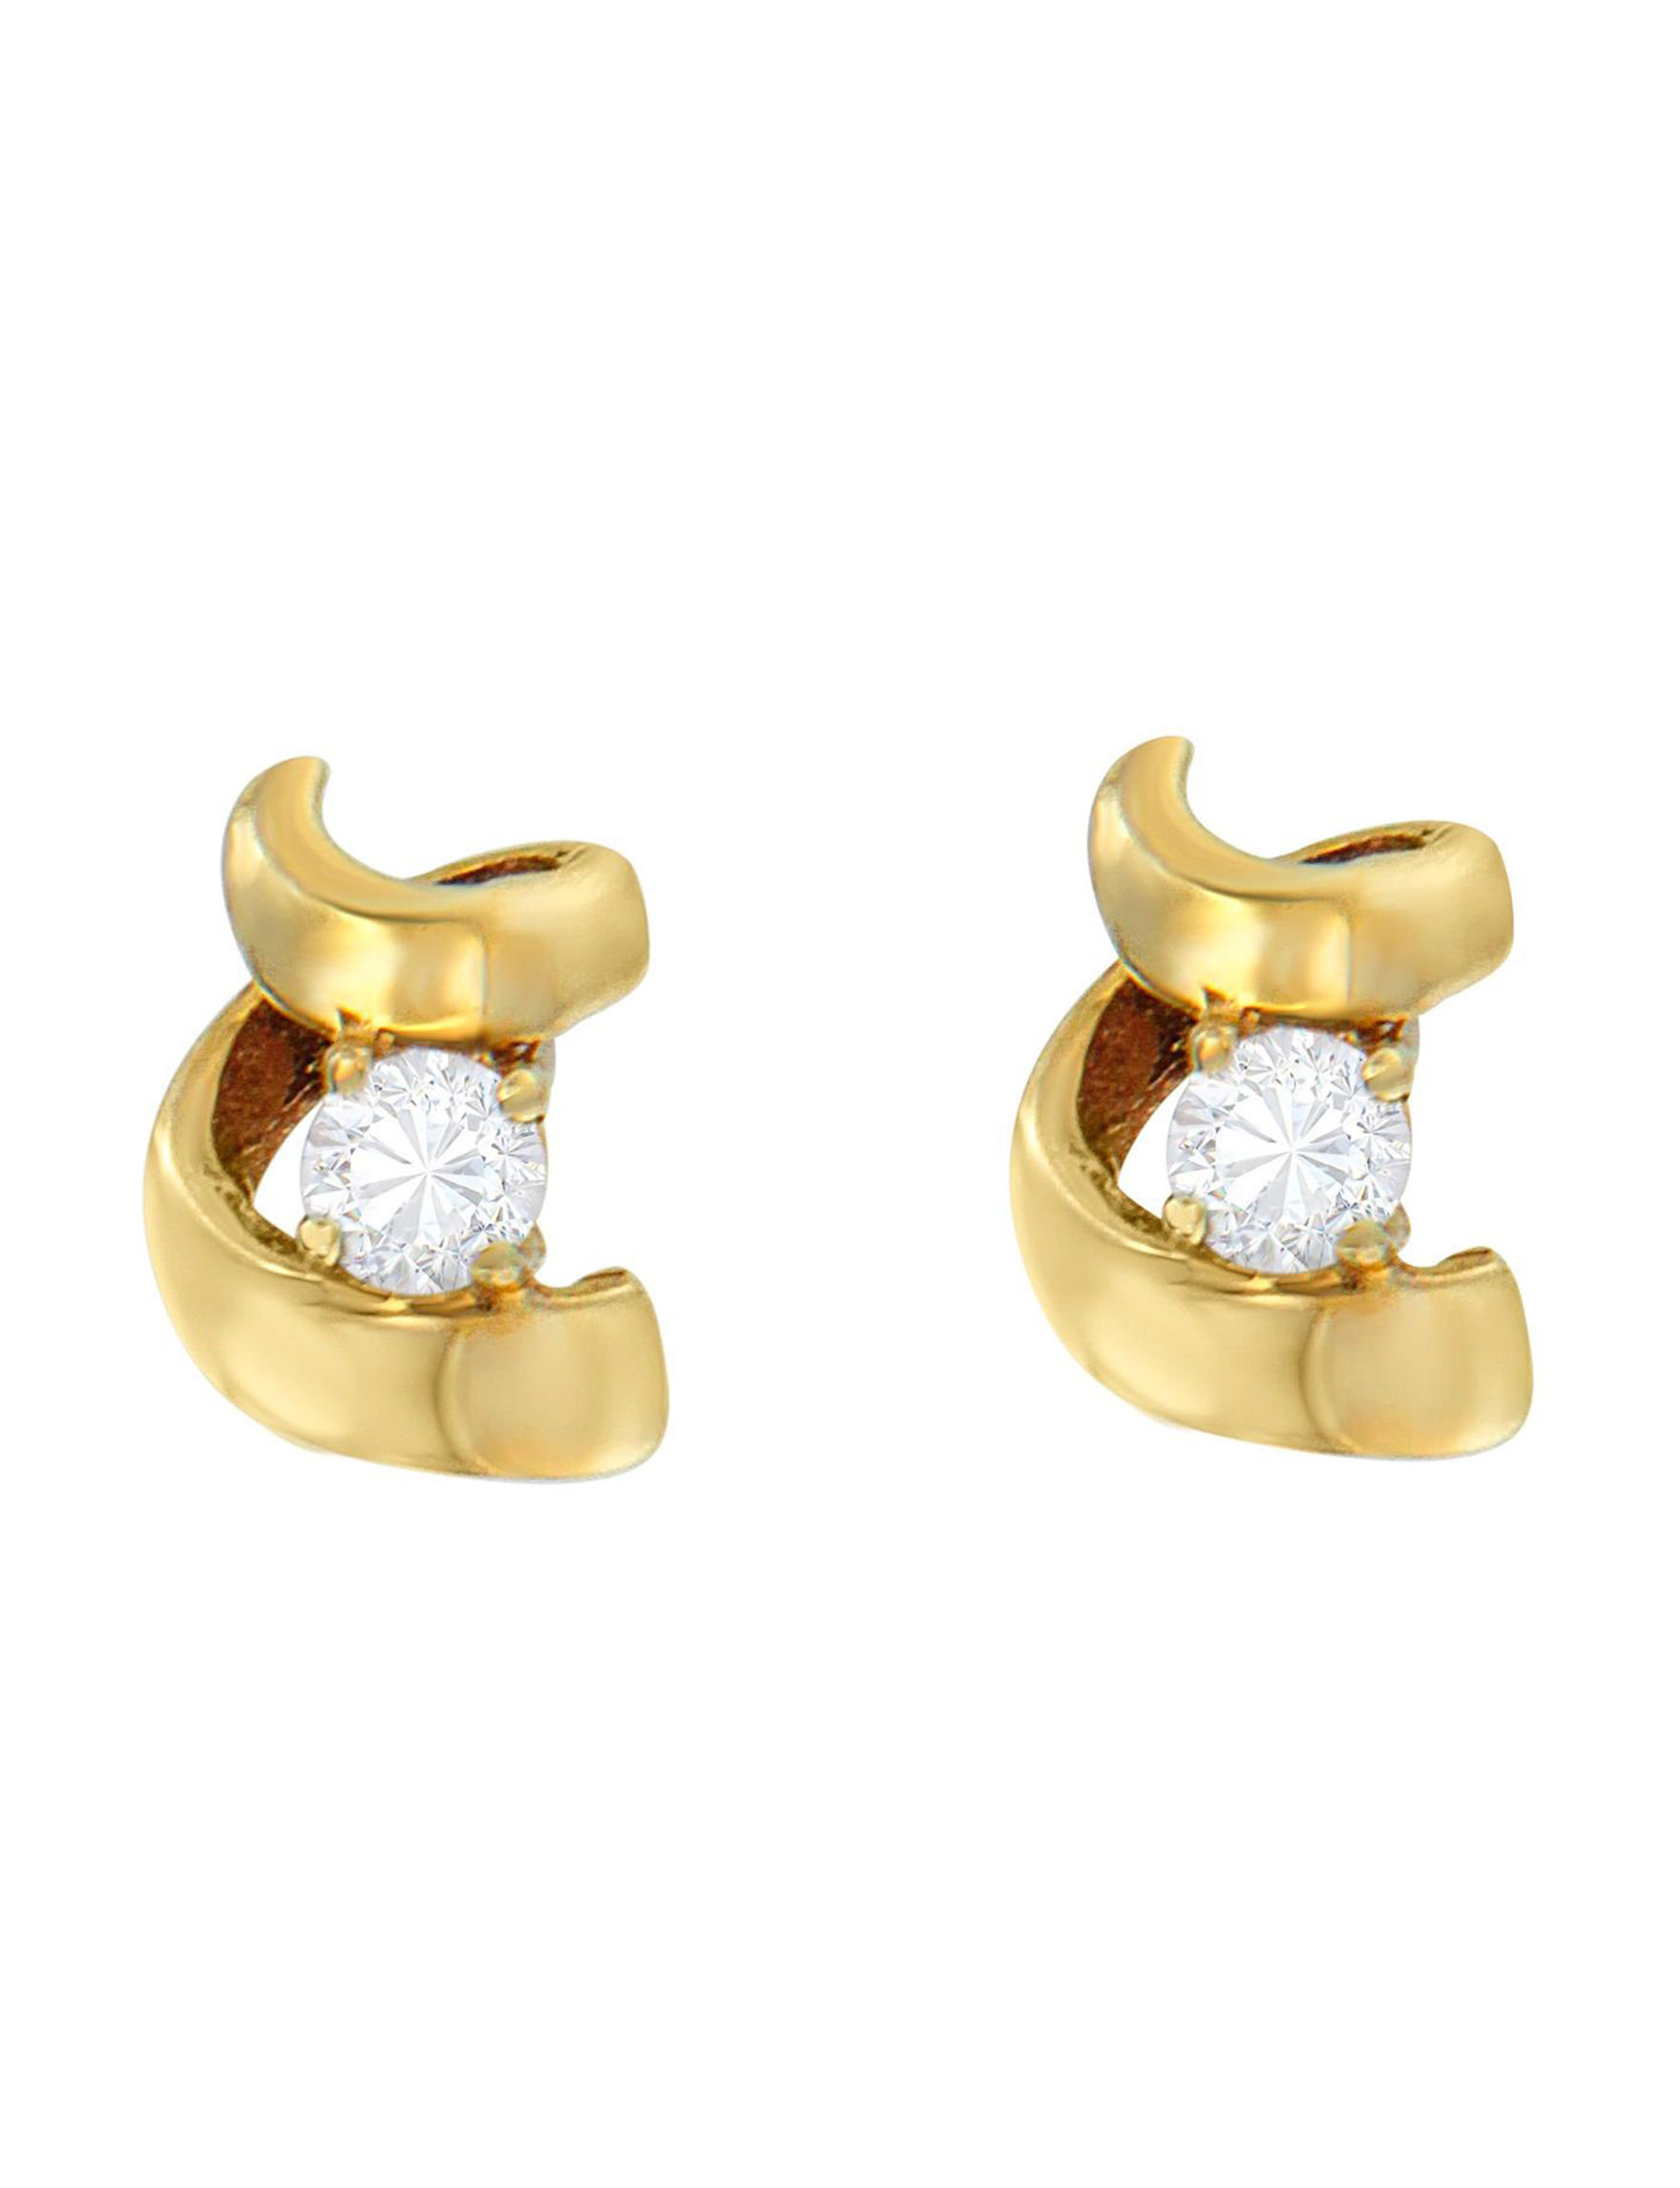 Original Classics Gold Studs Earrings Fine Jewelry